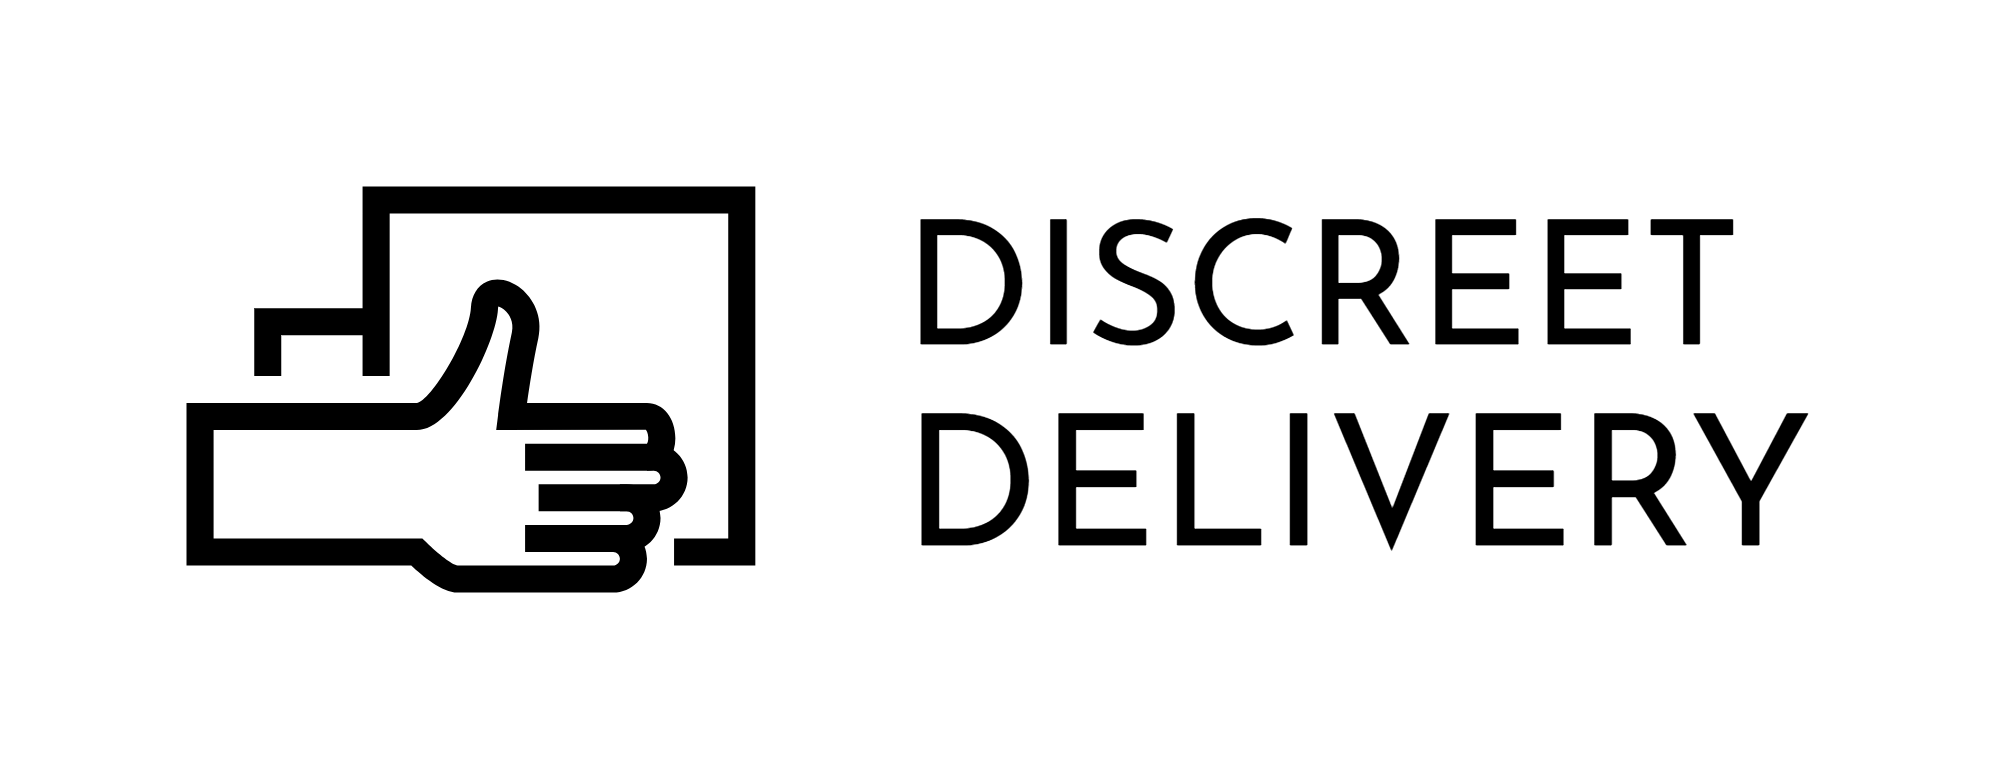 DISCREET-logo.png